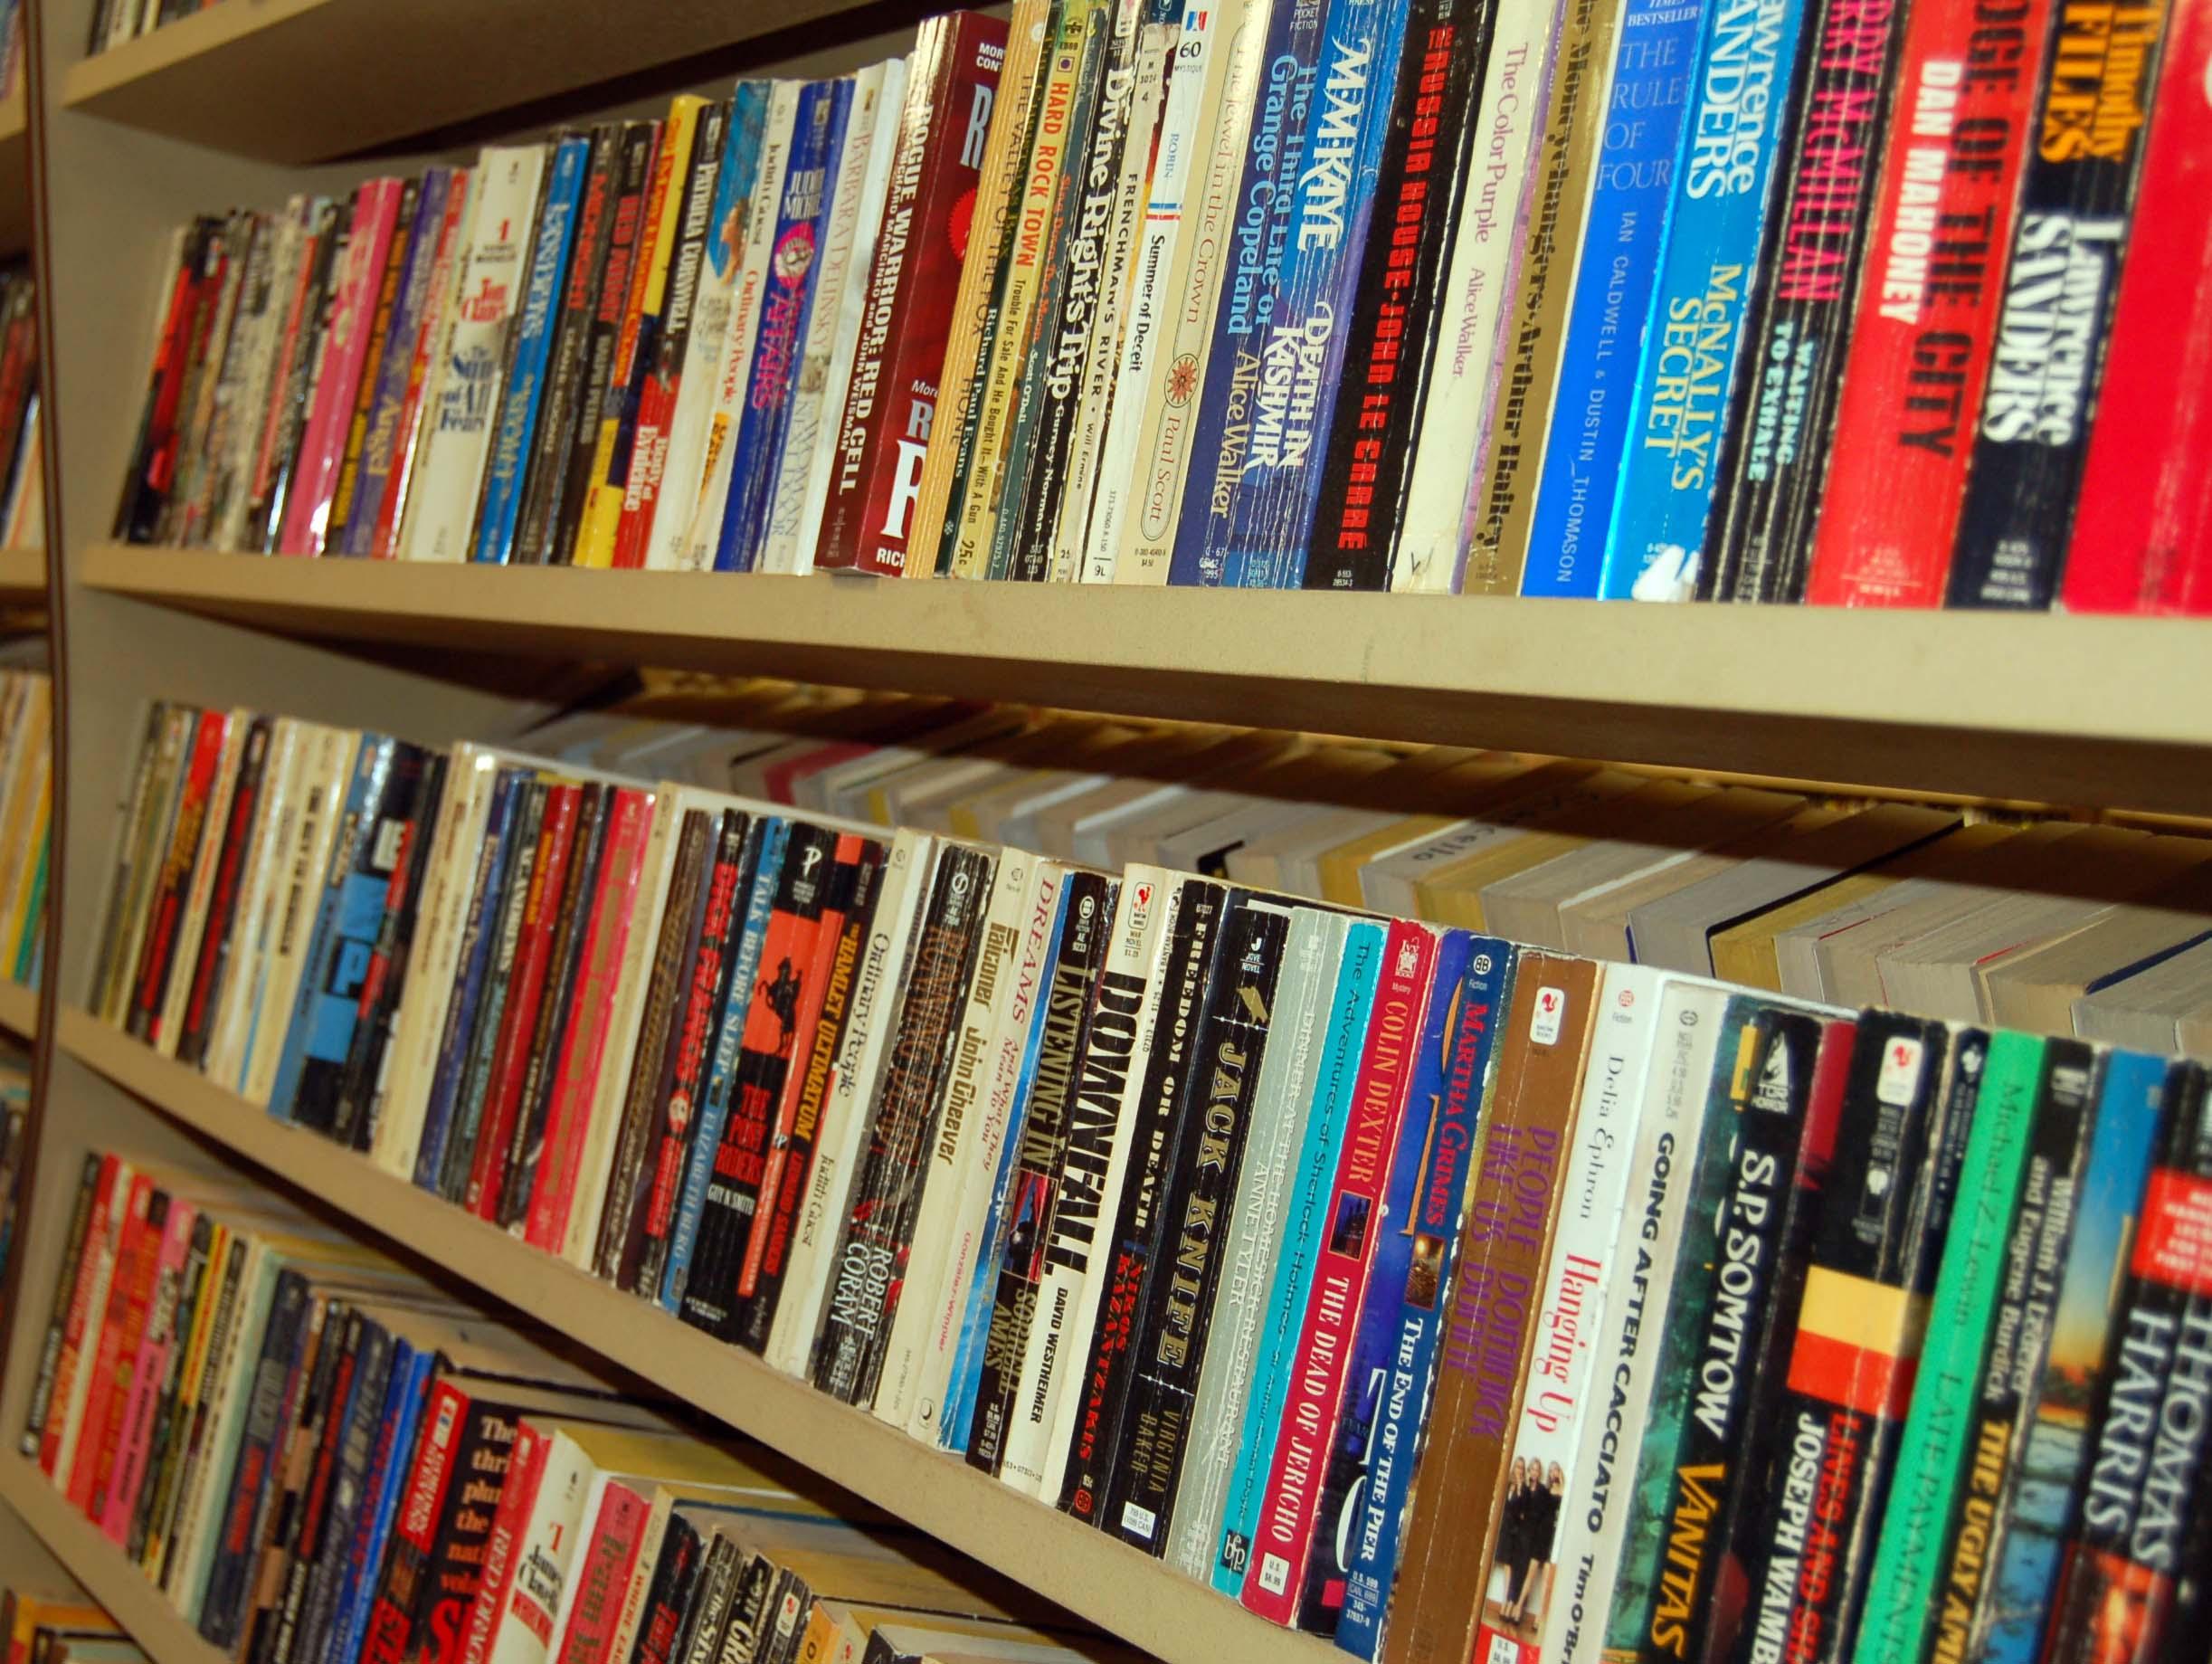 Librer A La Pilarica 2 Flc Suma # Muebles Suarez Belmonte De Miranda